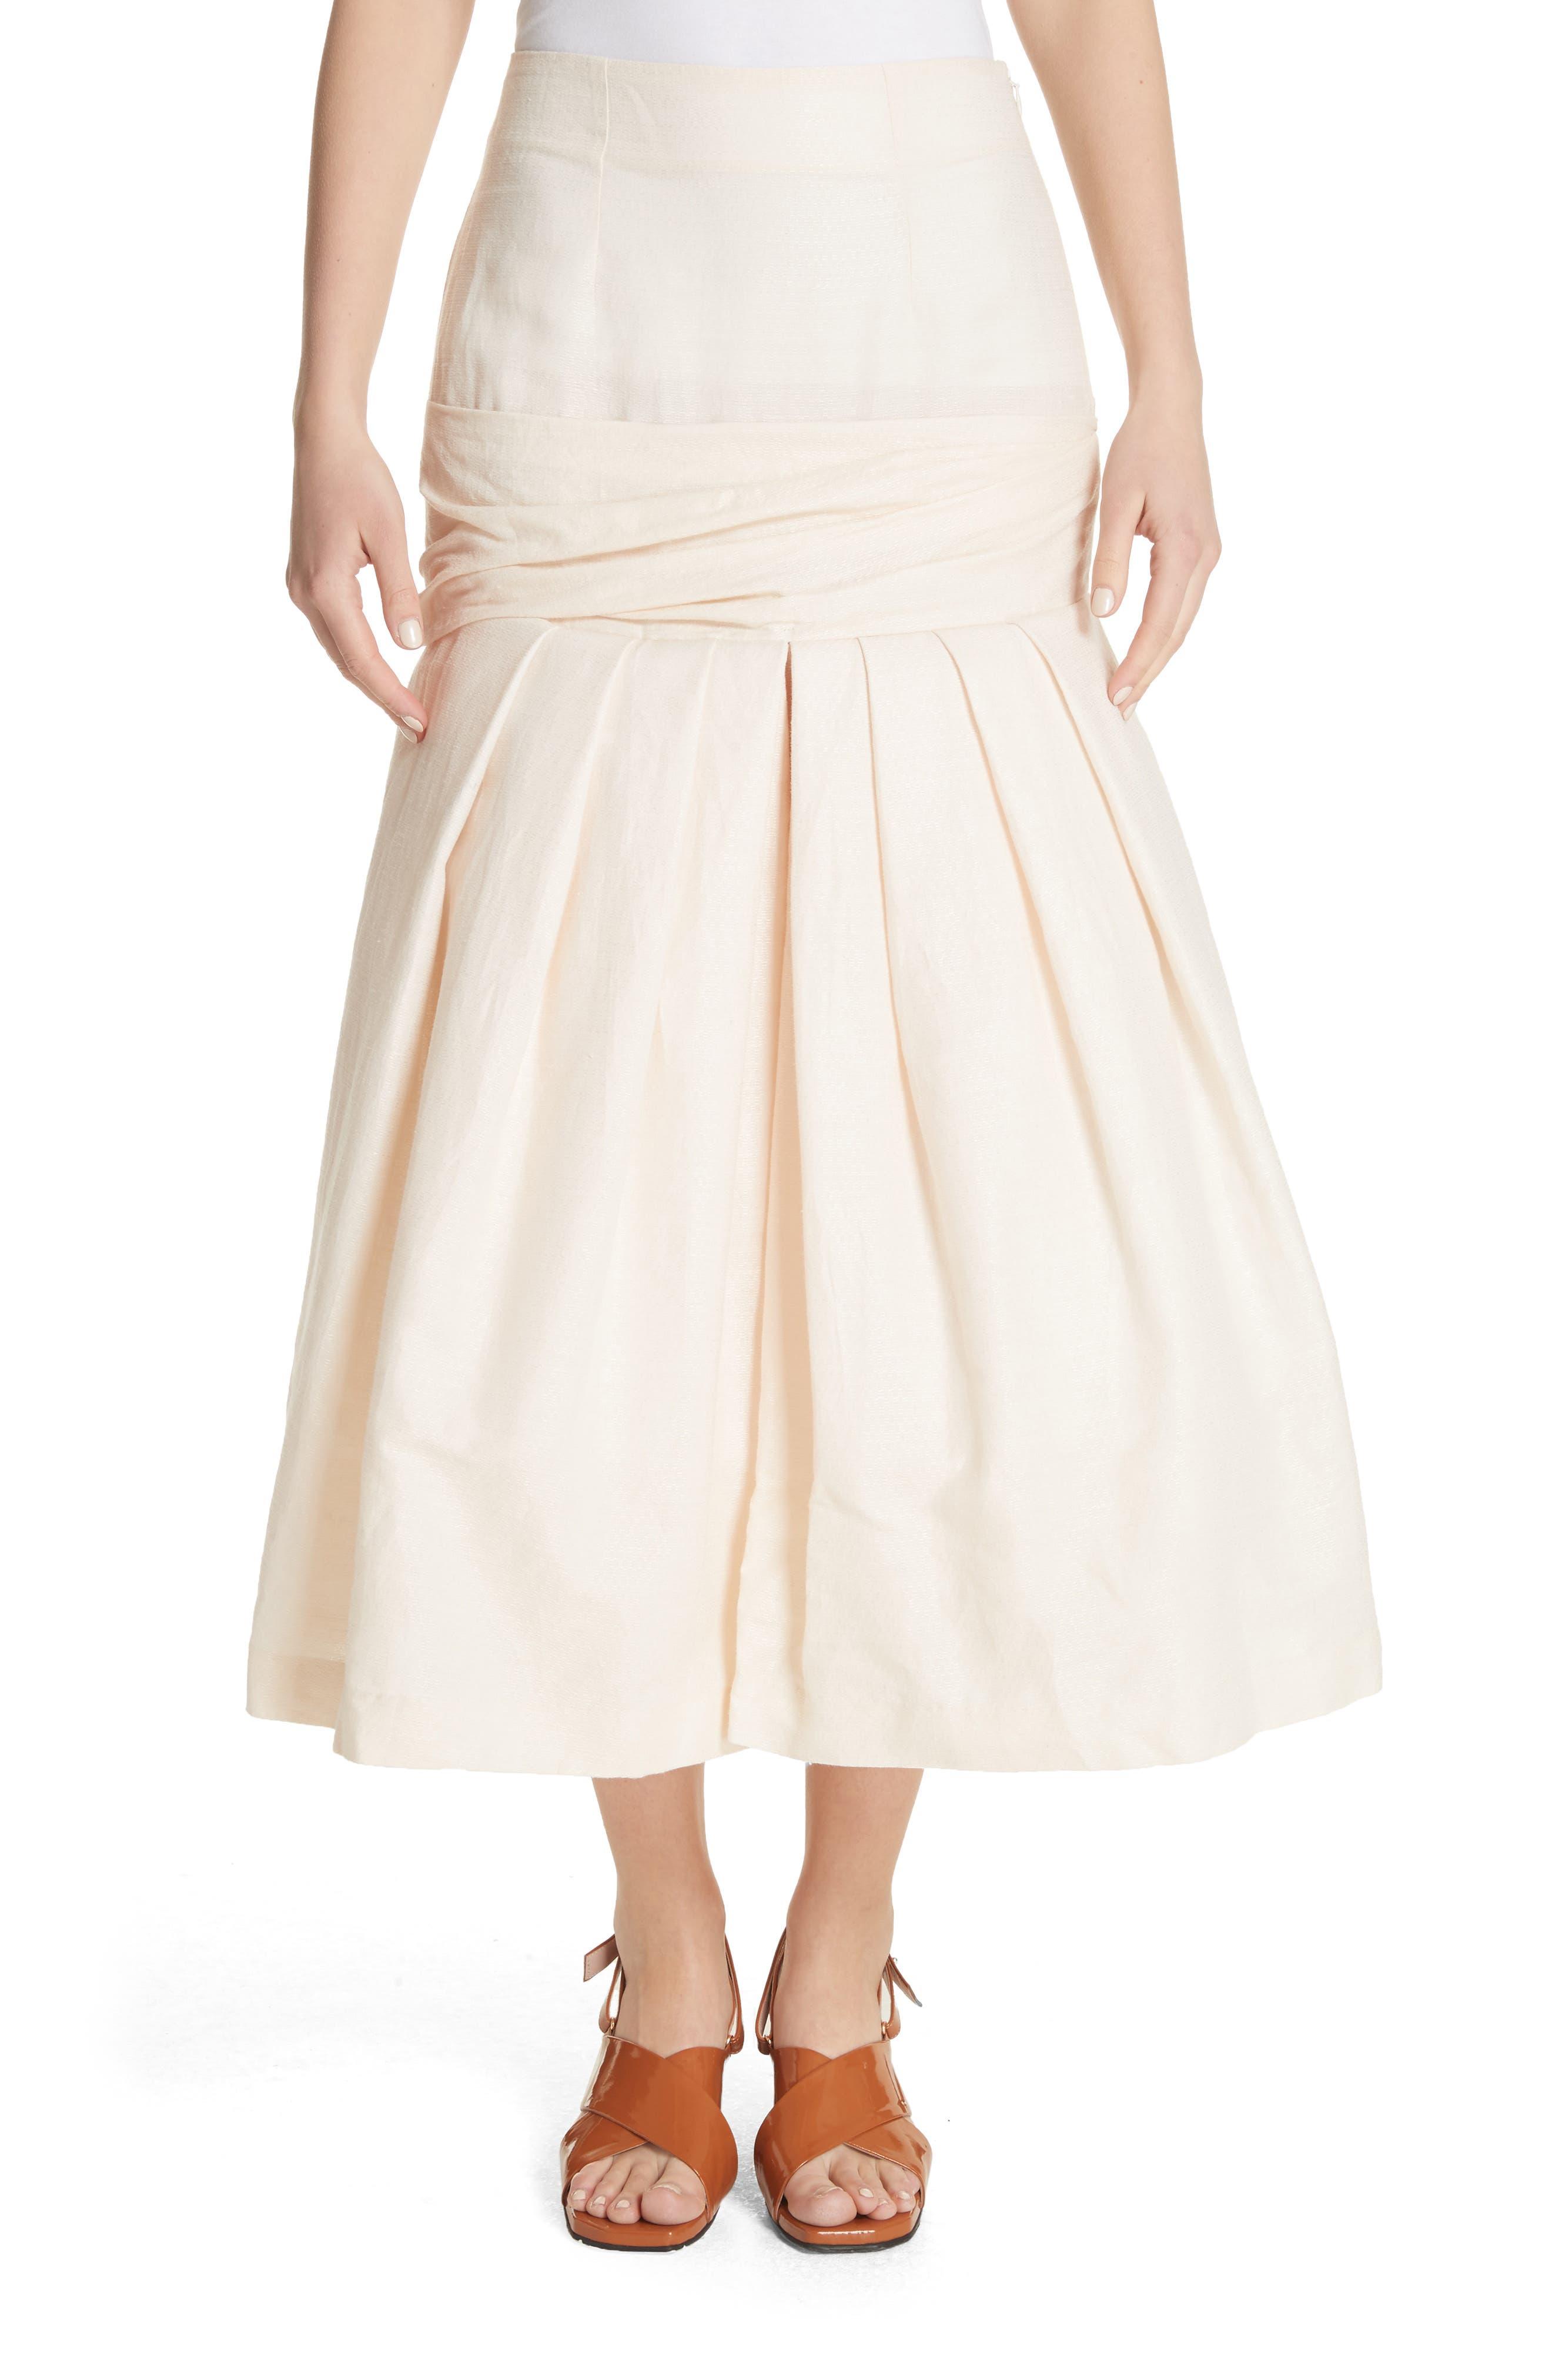 Alternate Image 1 Selected - Jacquemus La Jupe Mamao Skirt